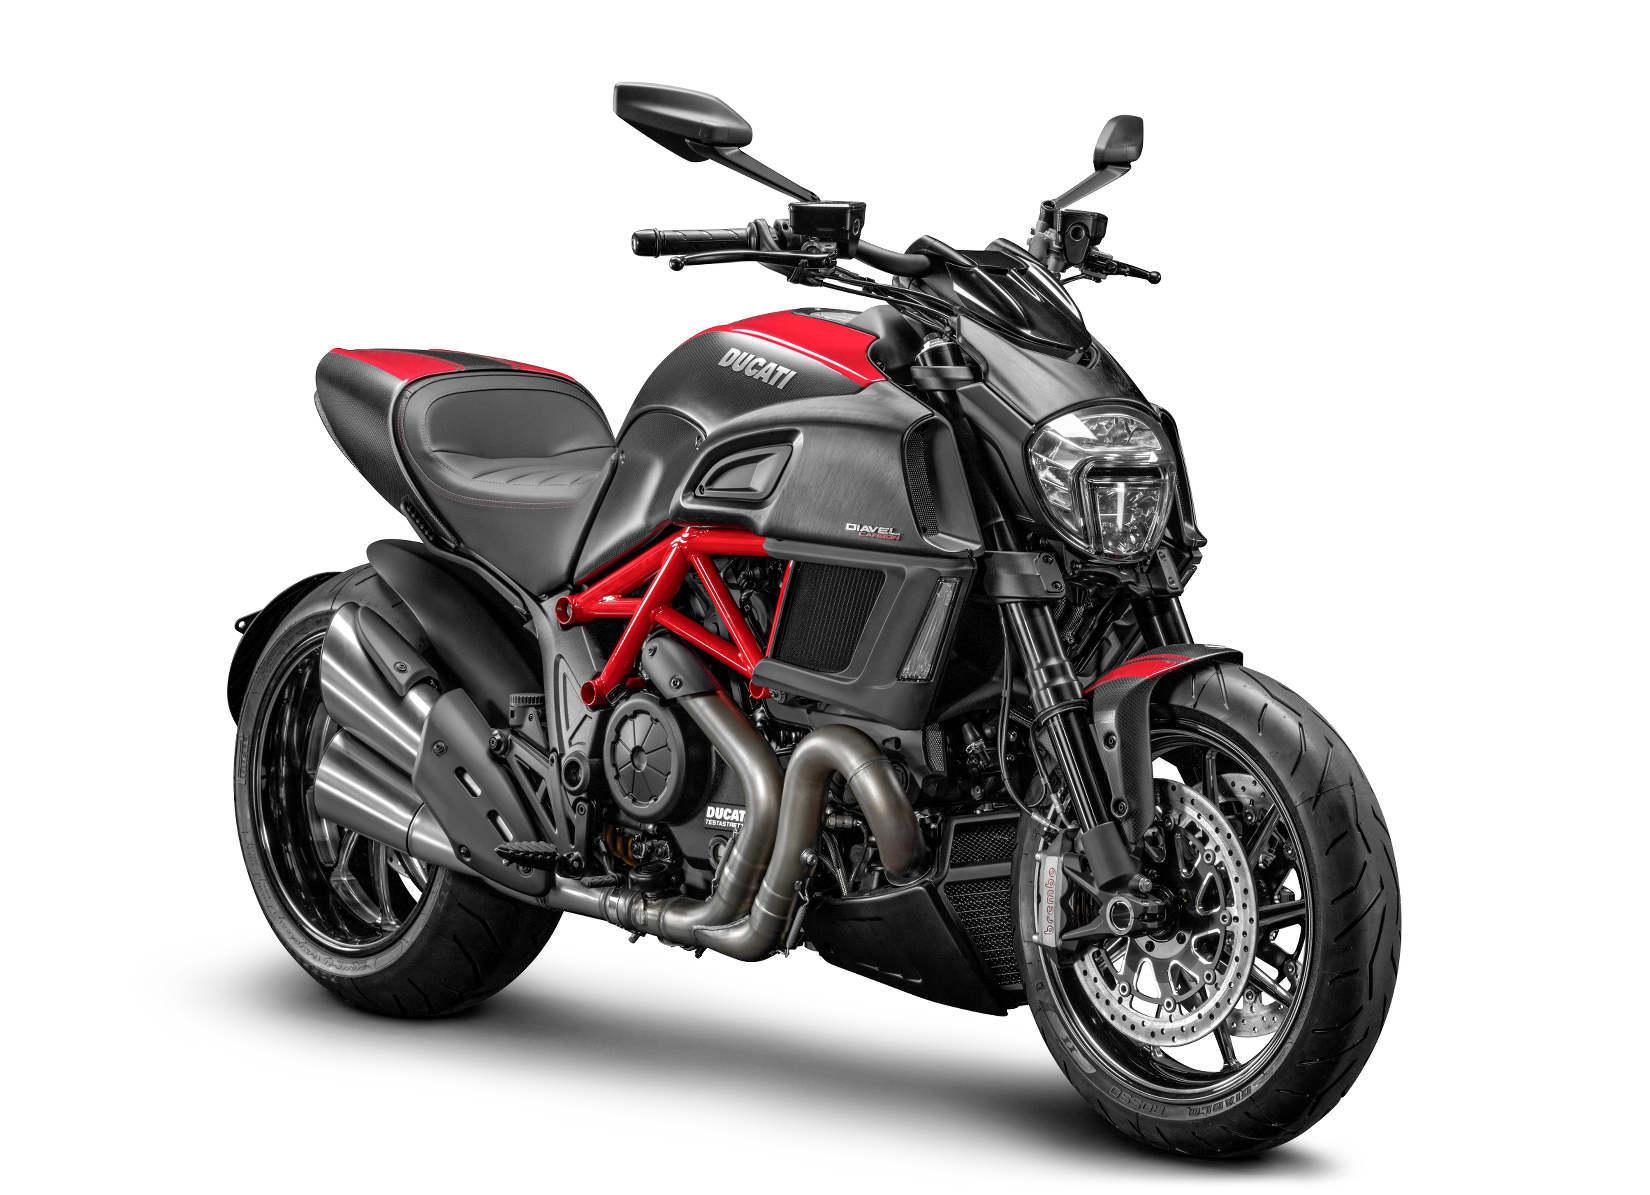 Ducati Diavel Wallpaper Hd